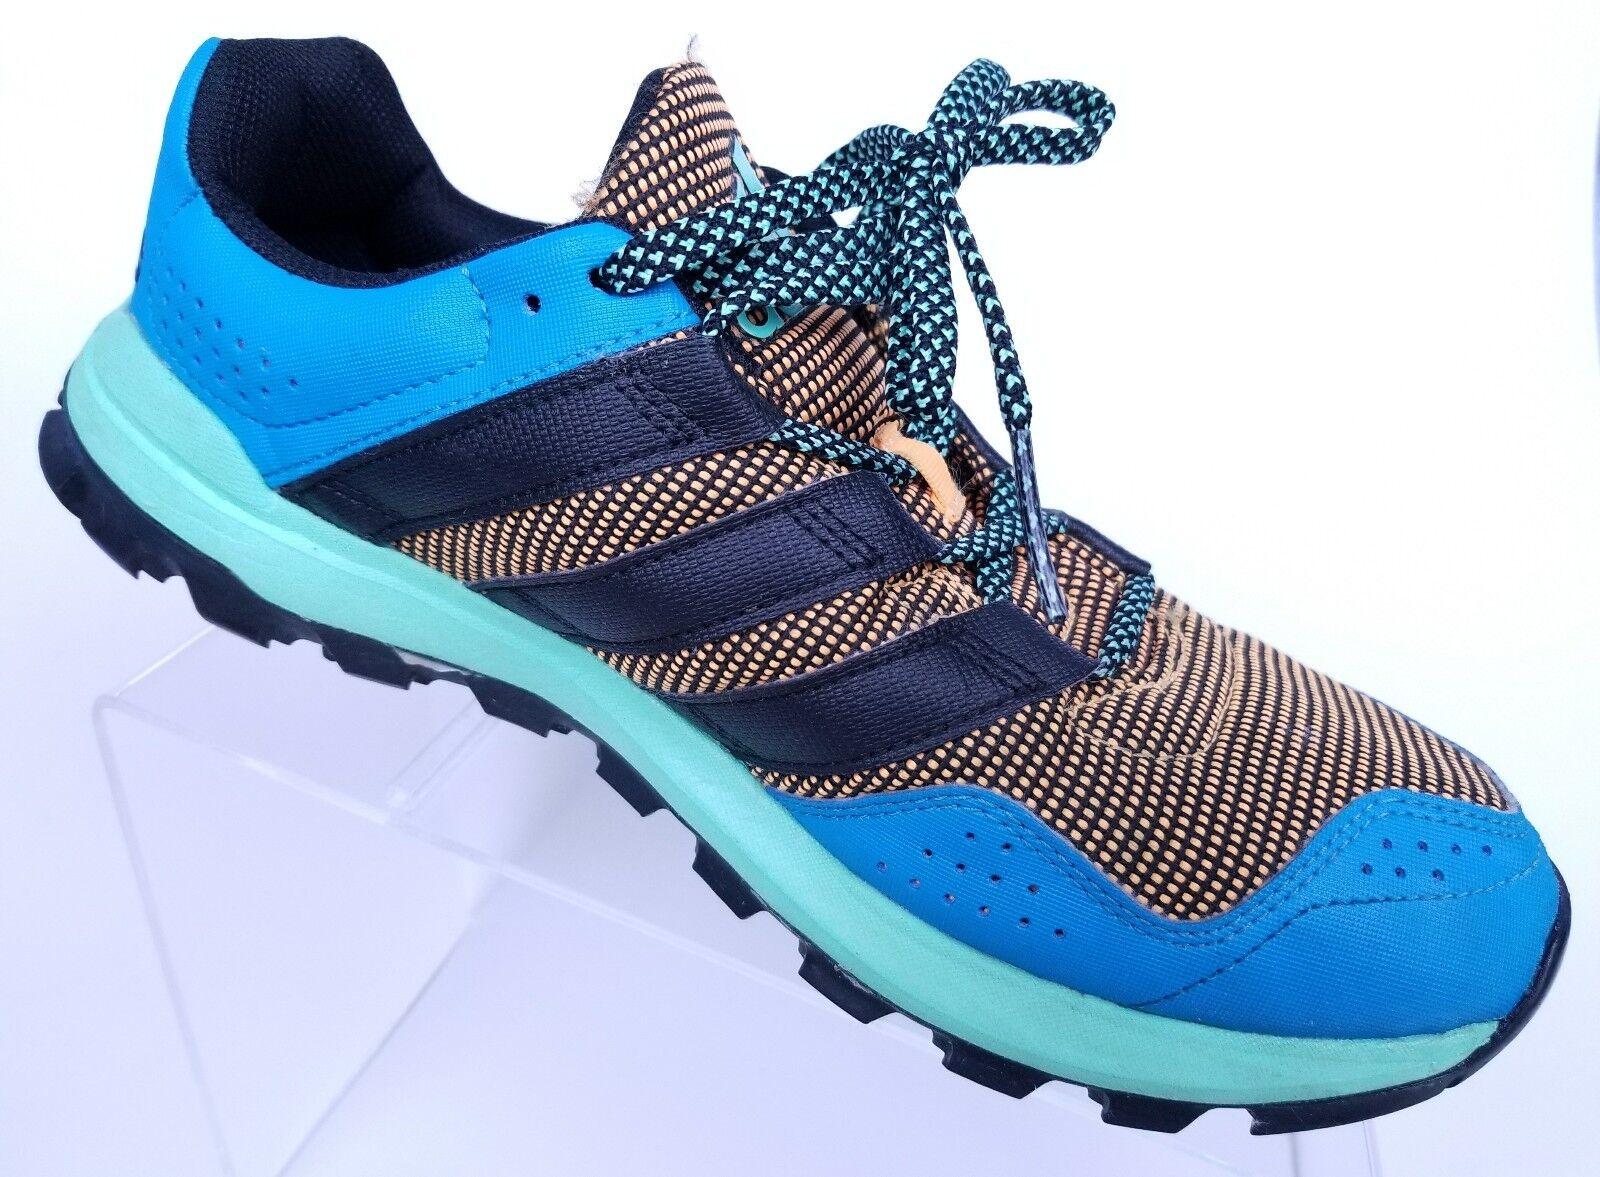 adidas crosstrainer slingshotmen trail running crosstrainer adidas sportschuhe mens größe 8 6fc7f5